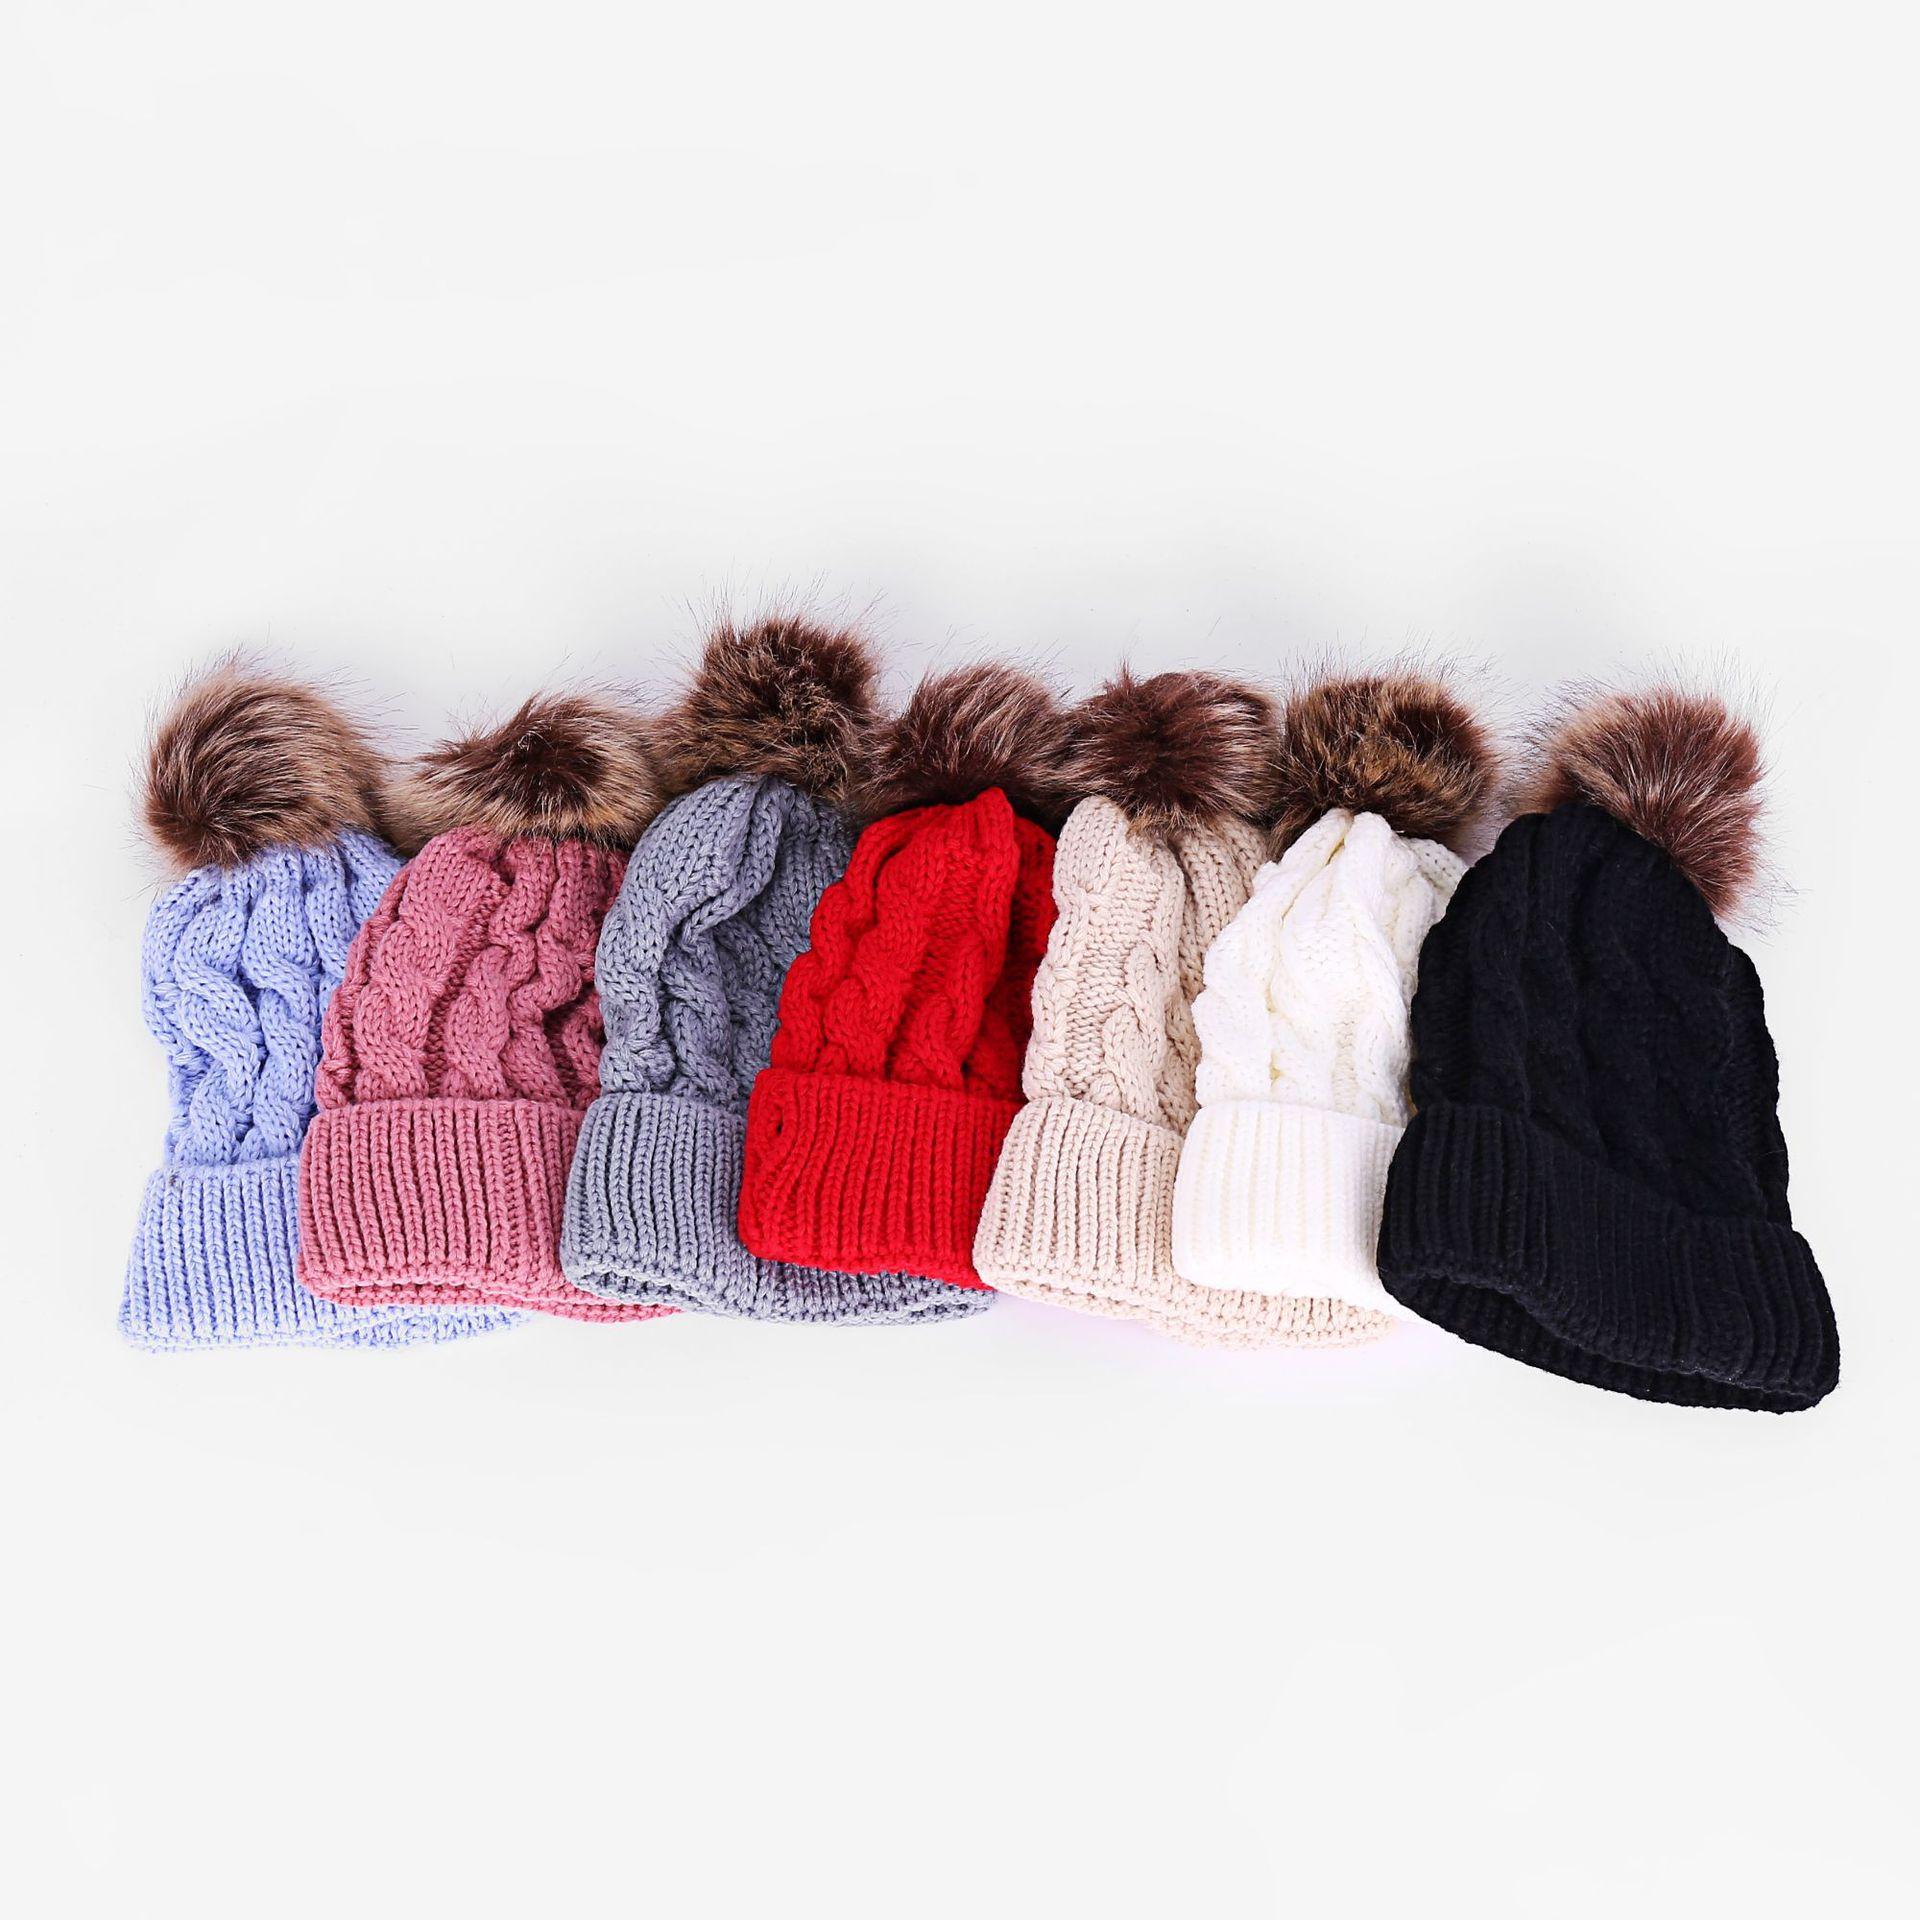 Paprent-child Twist Pom Pom Beanies Crochet Winter Hat Women Kids Children Cuffed Skull Caps Knitted Tuque Ski Slouchy Headwear PPA110